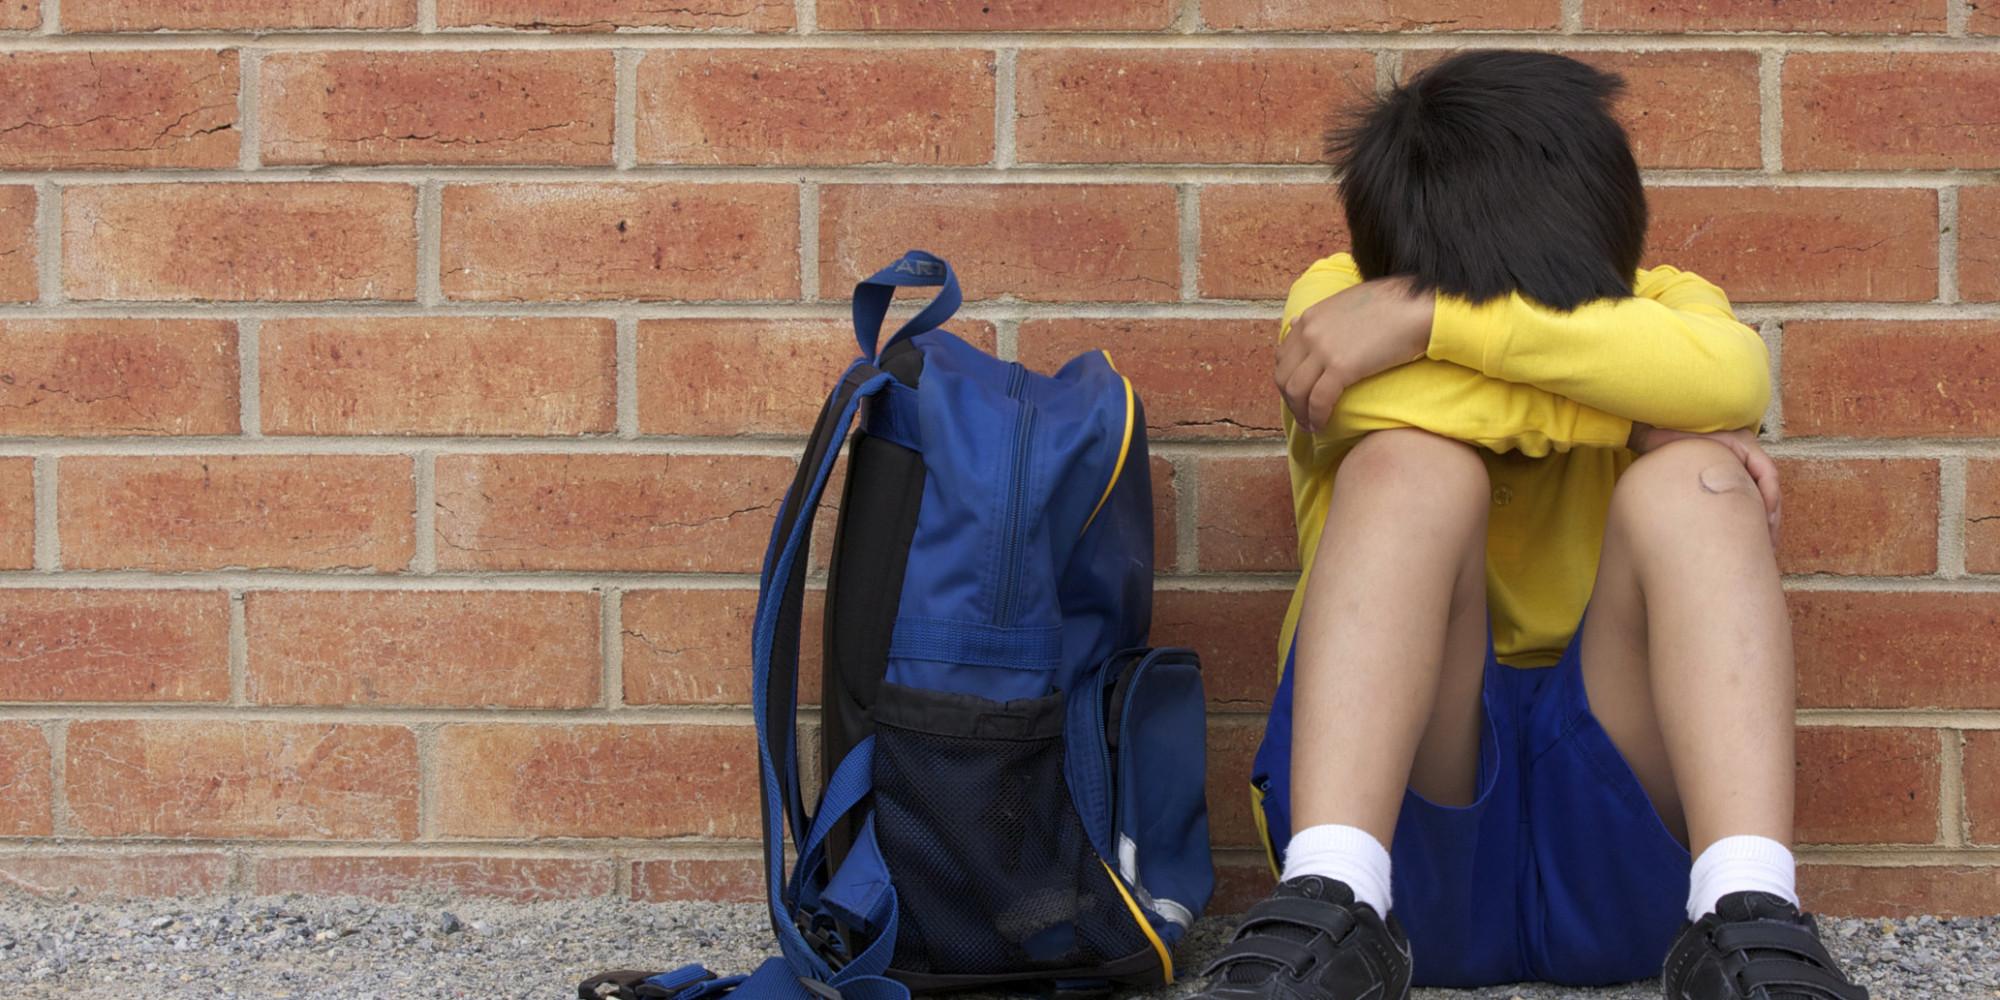 How do we make bullying history?